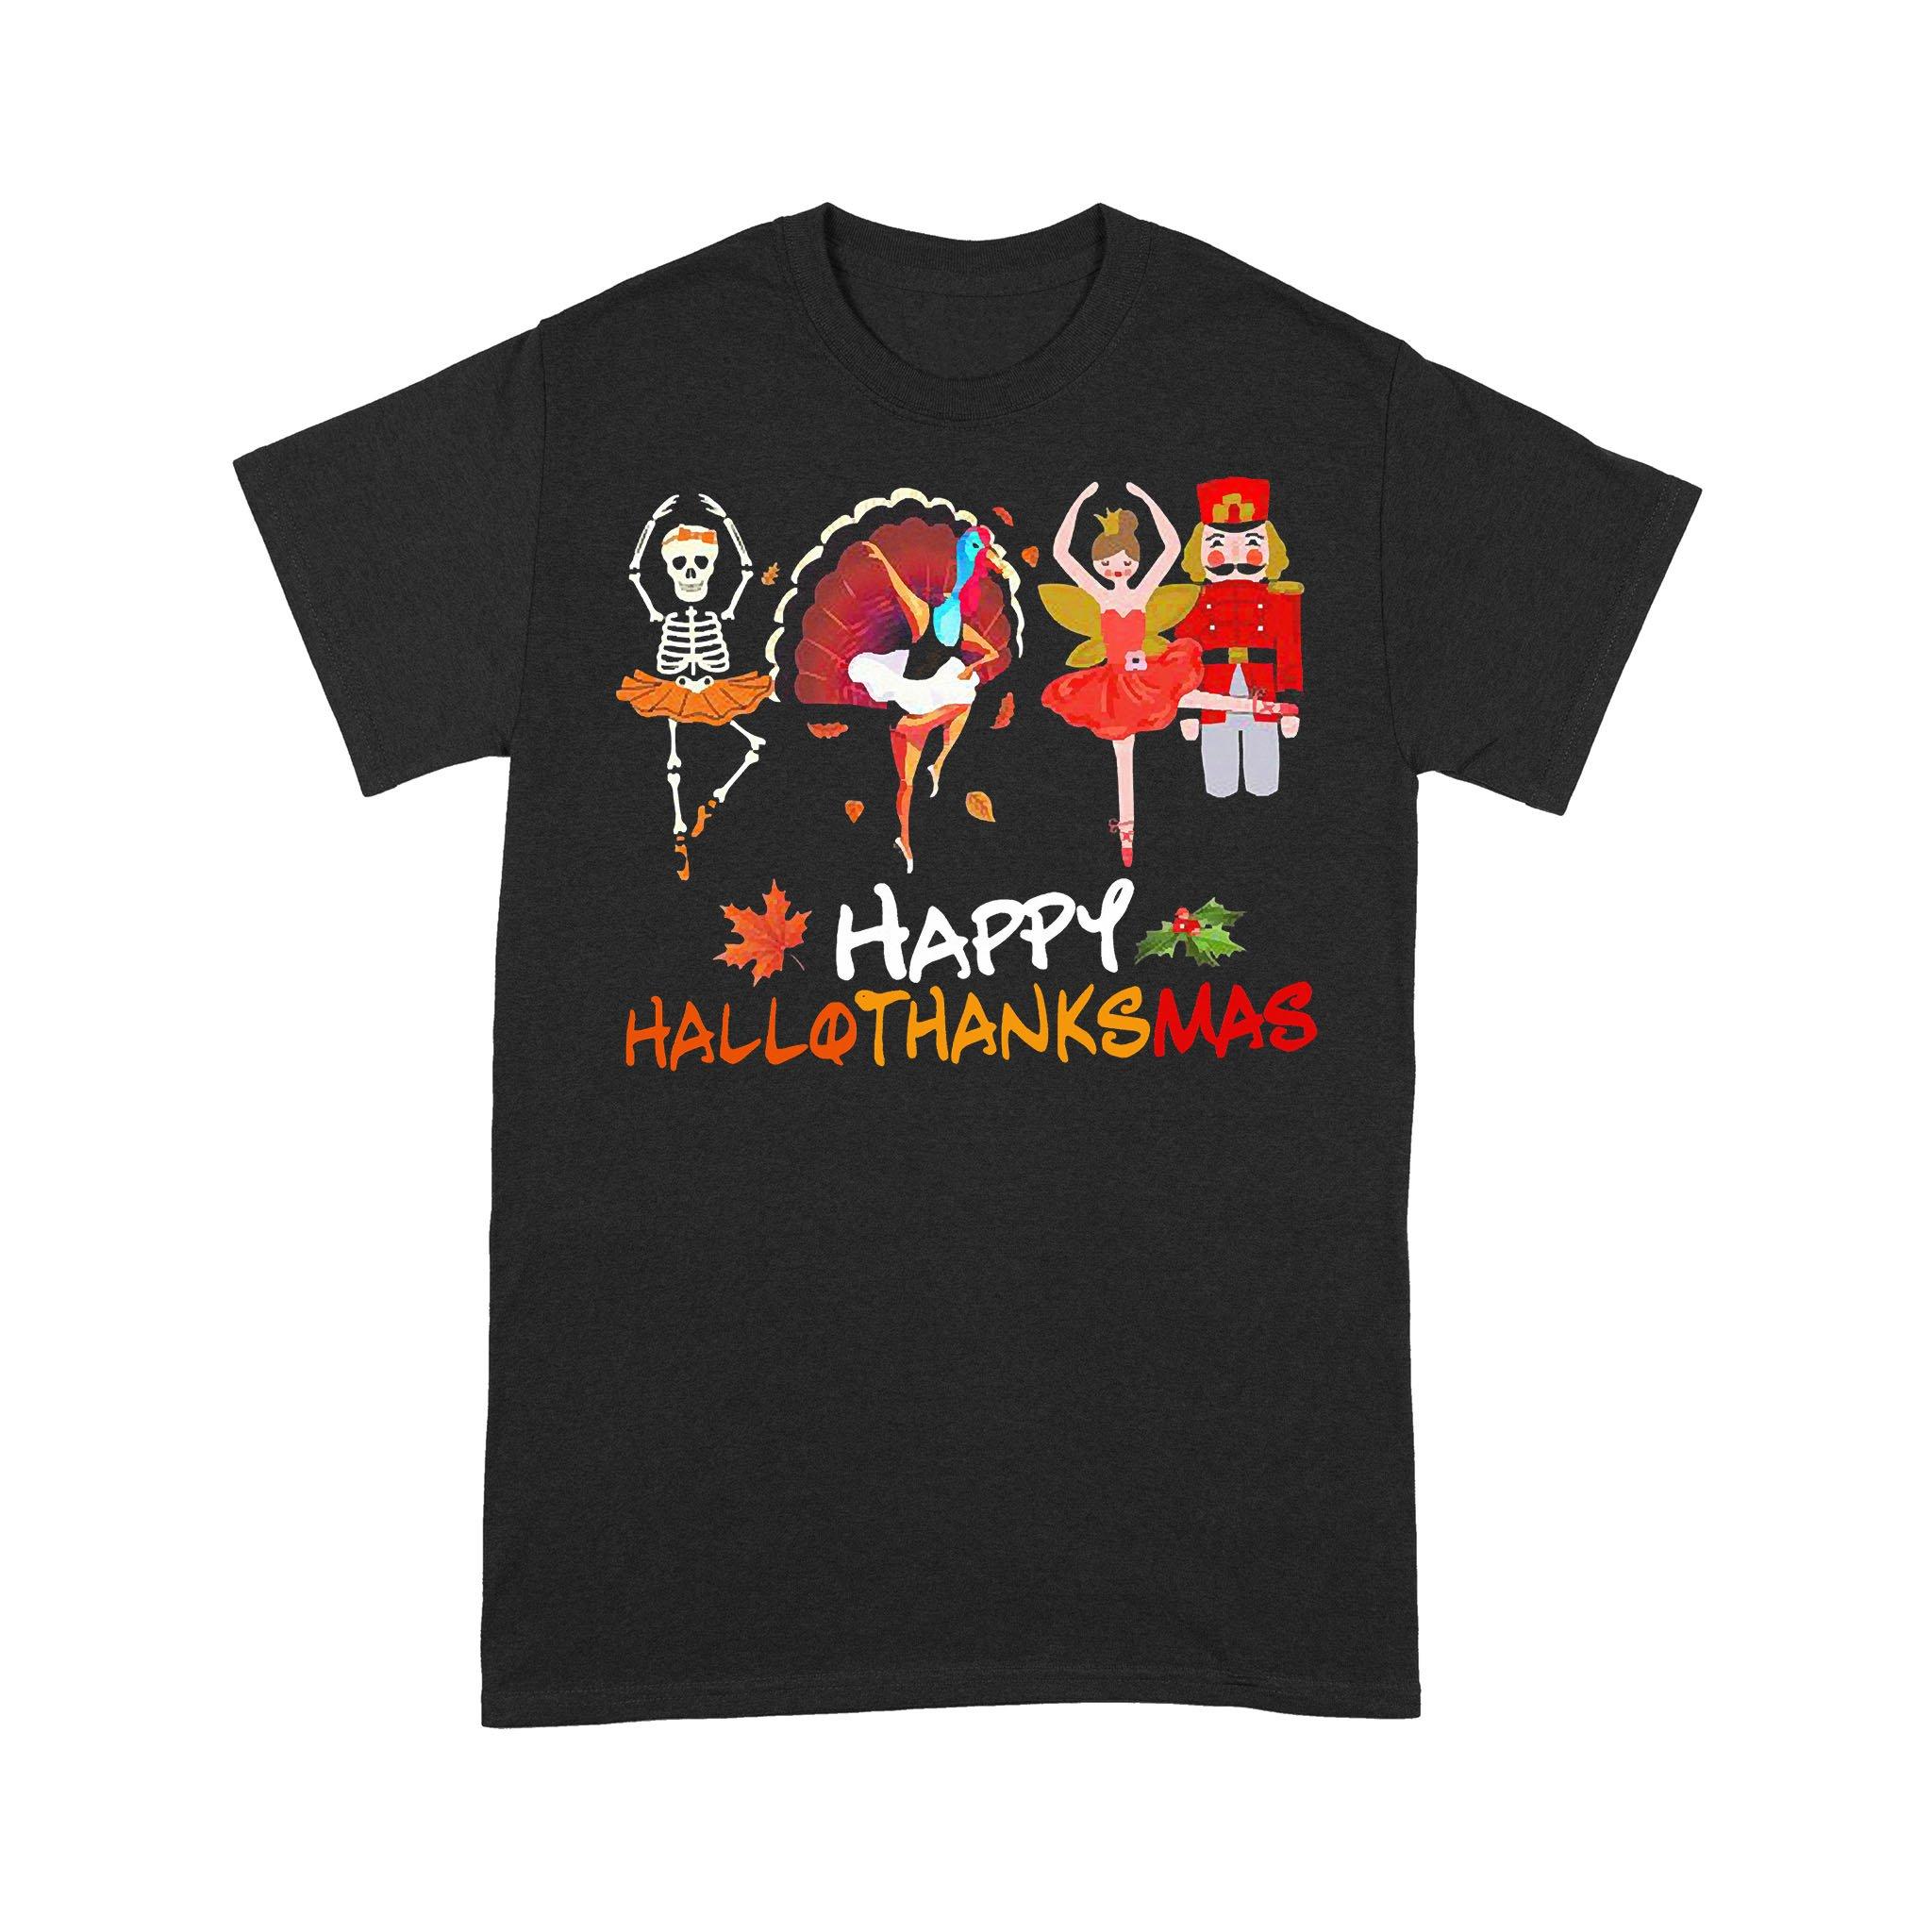 Ballet Squad Happy Hallothanksmas T-shirt